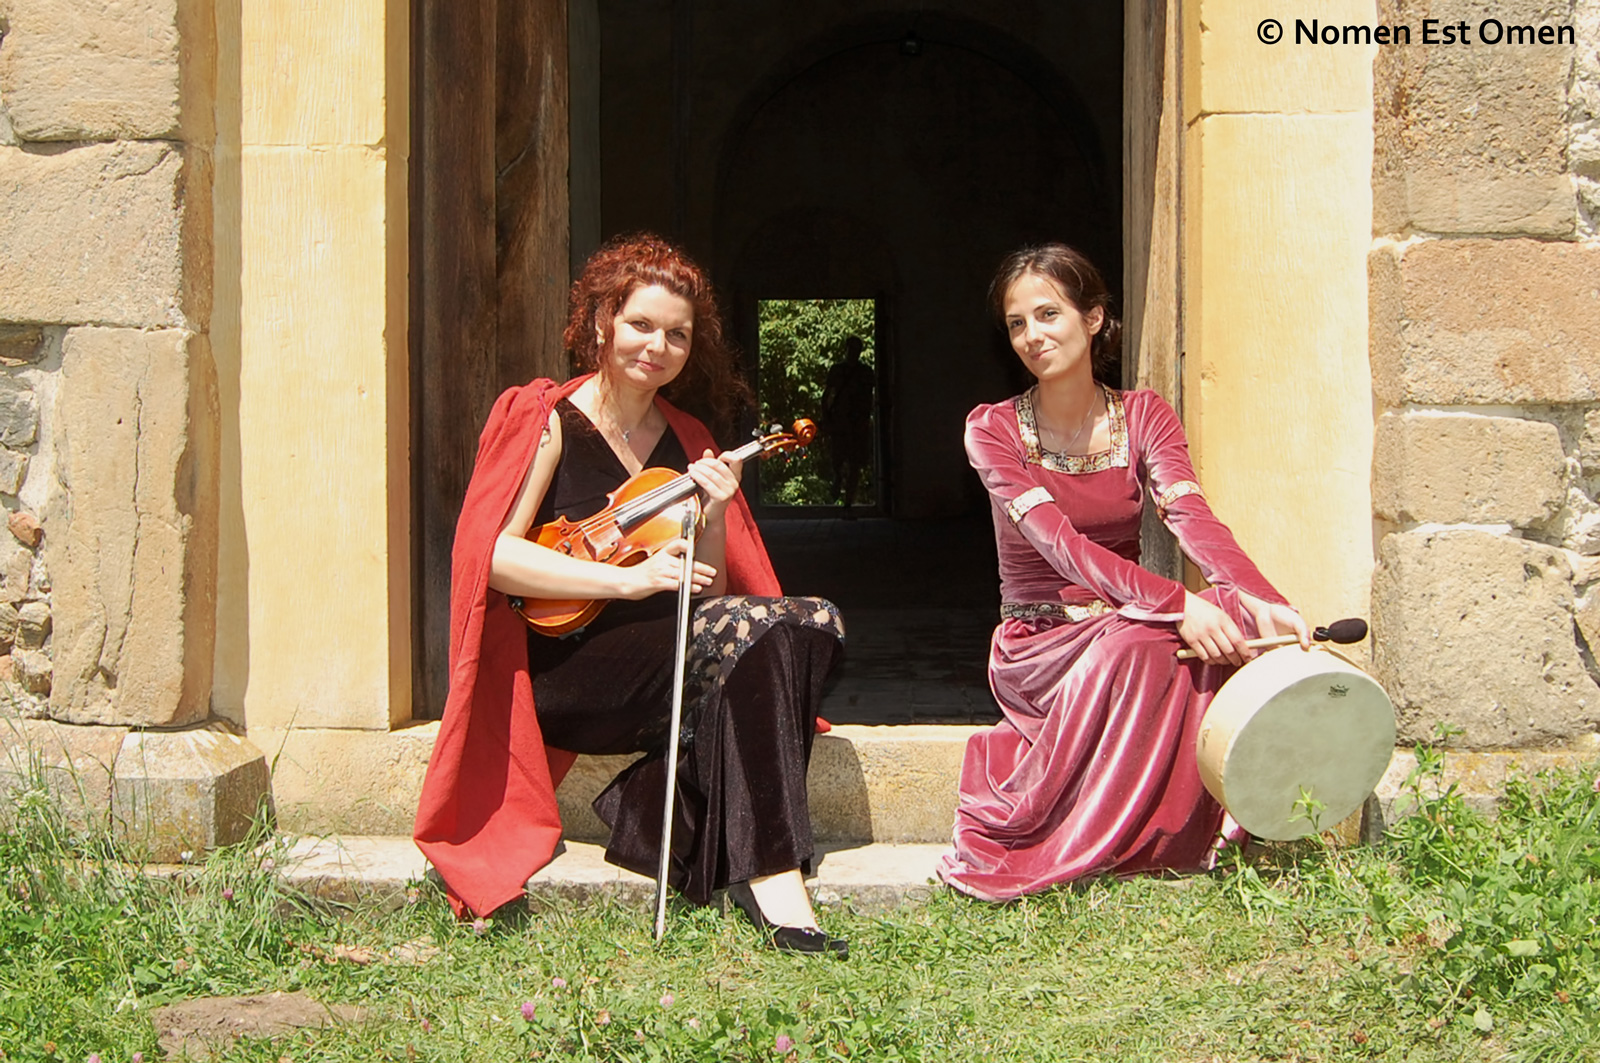 Nomen Est Omen in the fortified churches in Transylvania - Cisnadioara